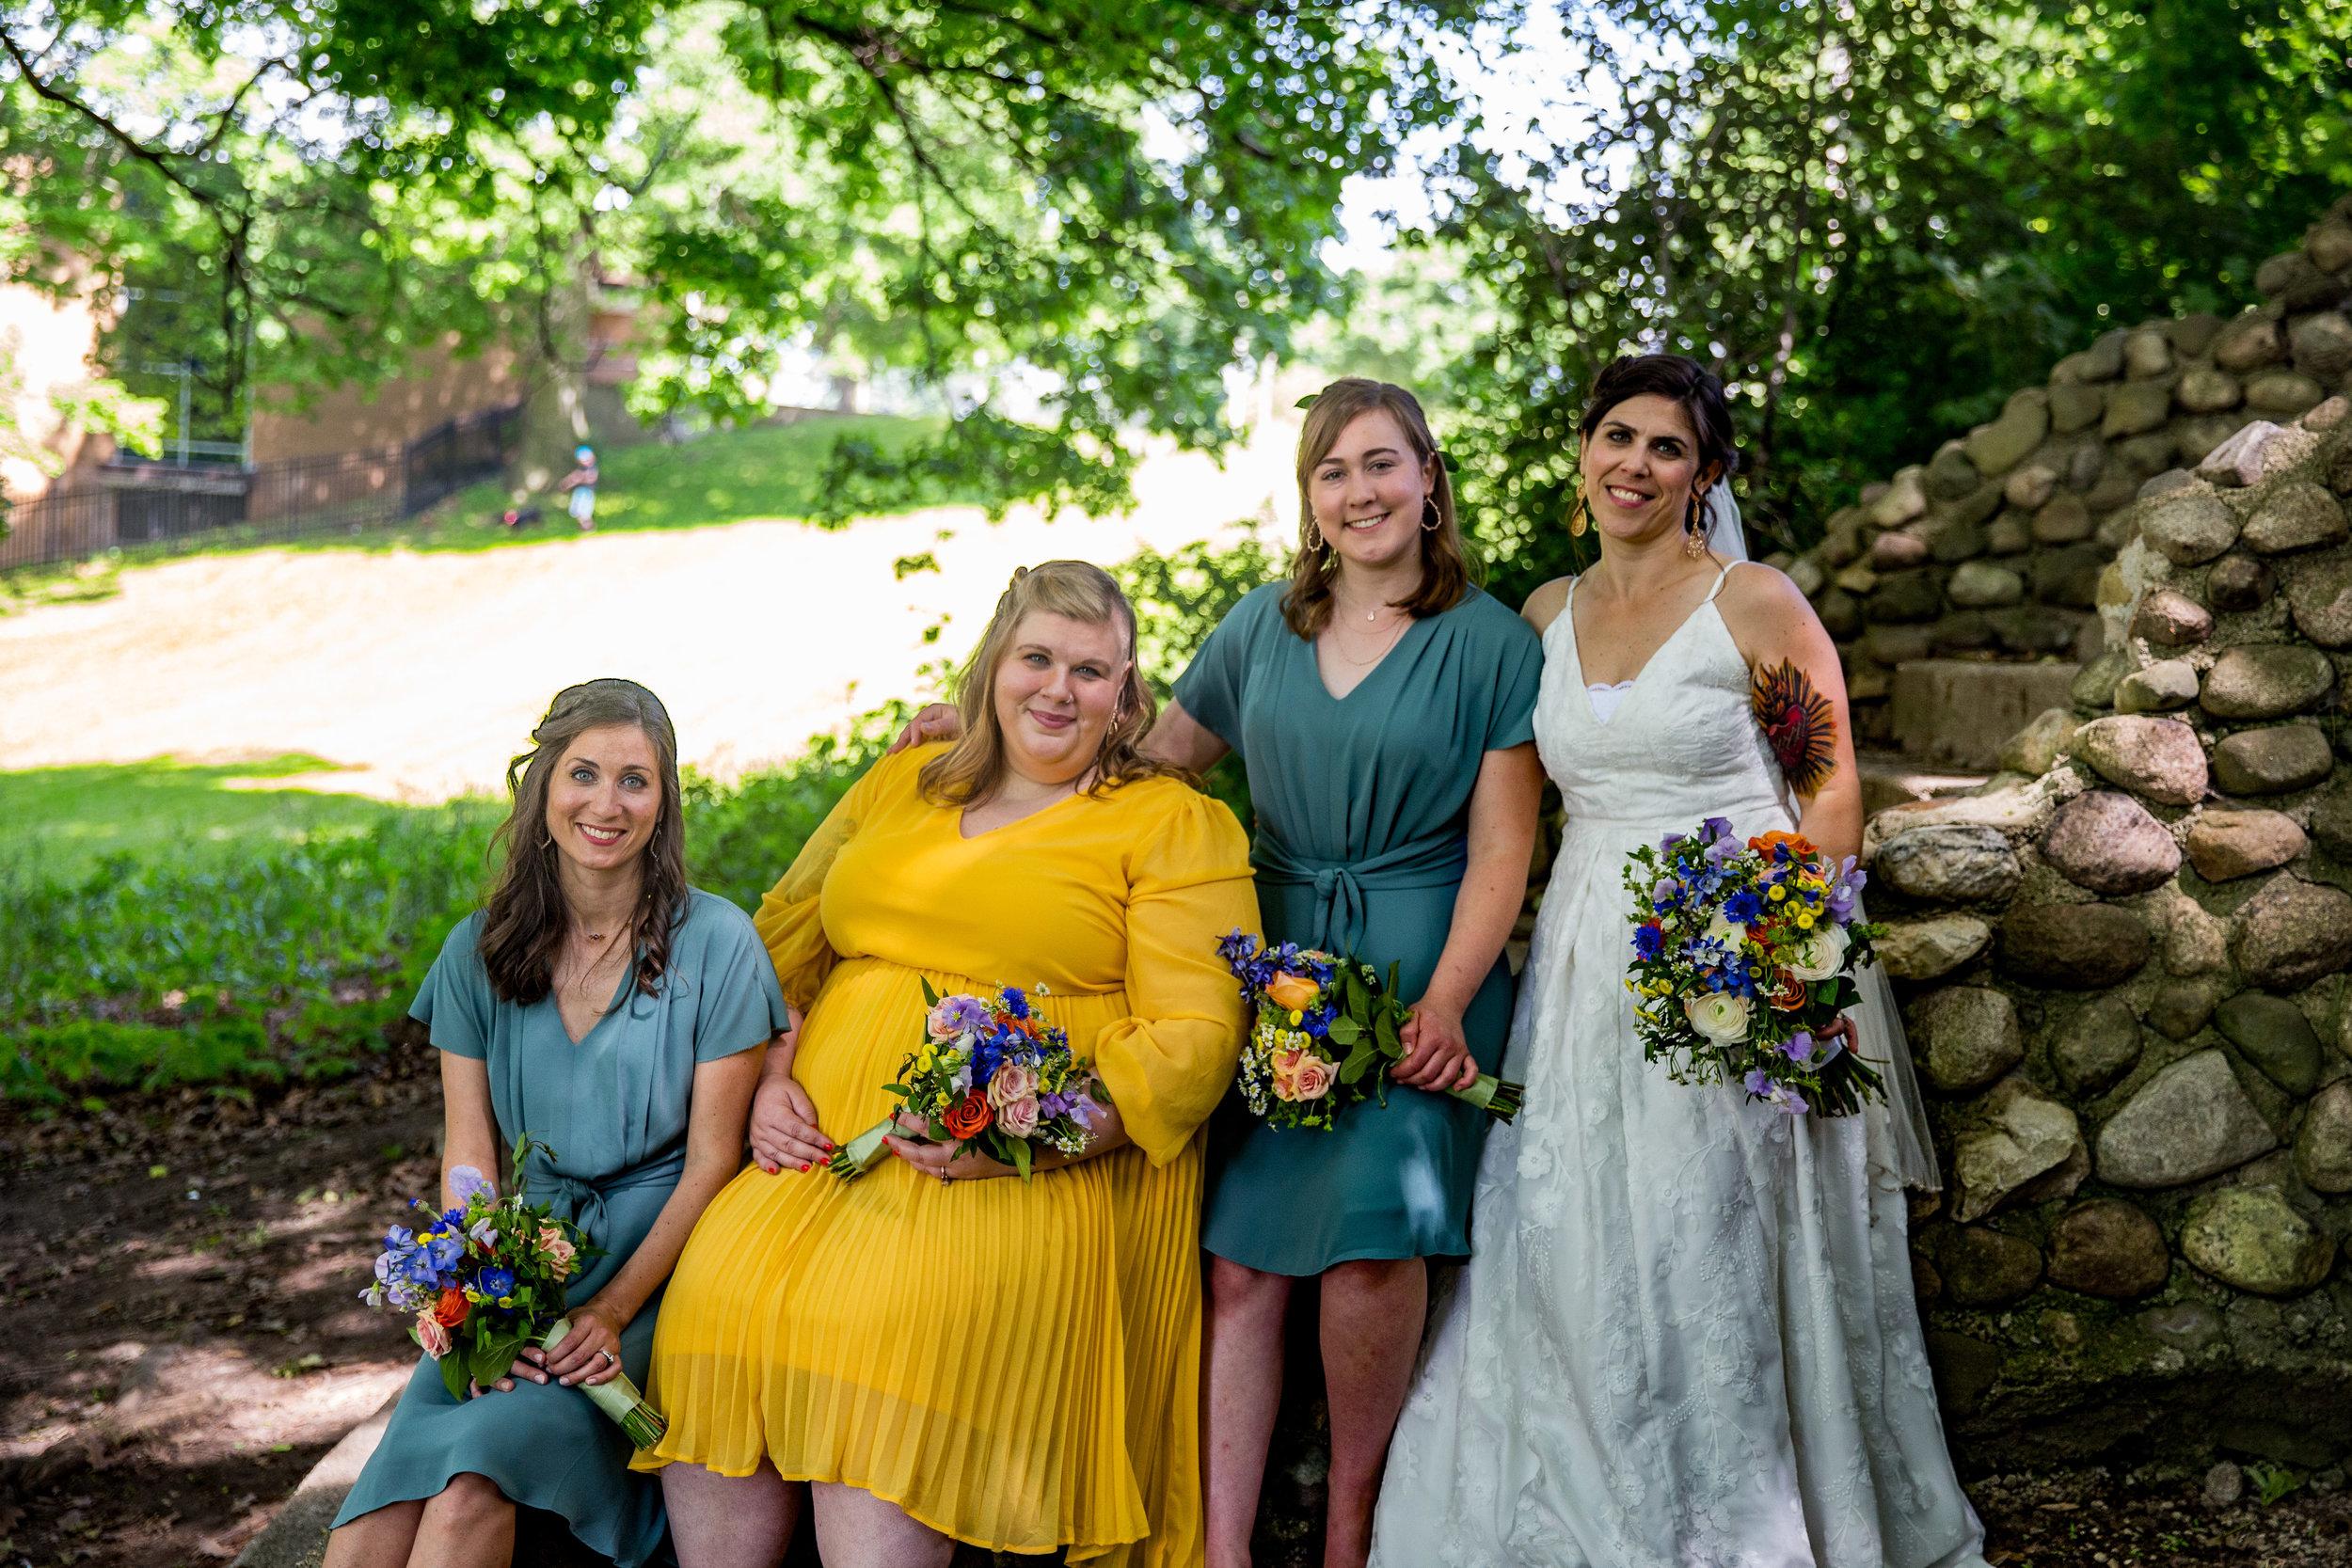 Natalie and Dallas Mooney Wedding 6-8-19_Tania Watt Photography-379.jpg